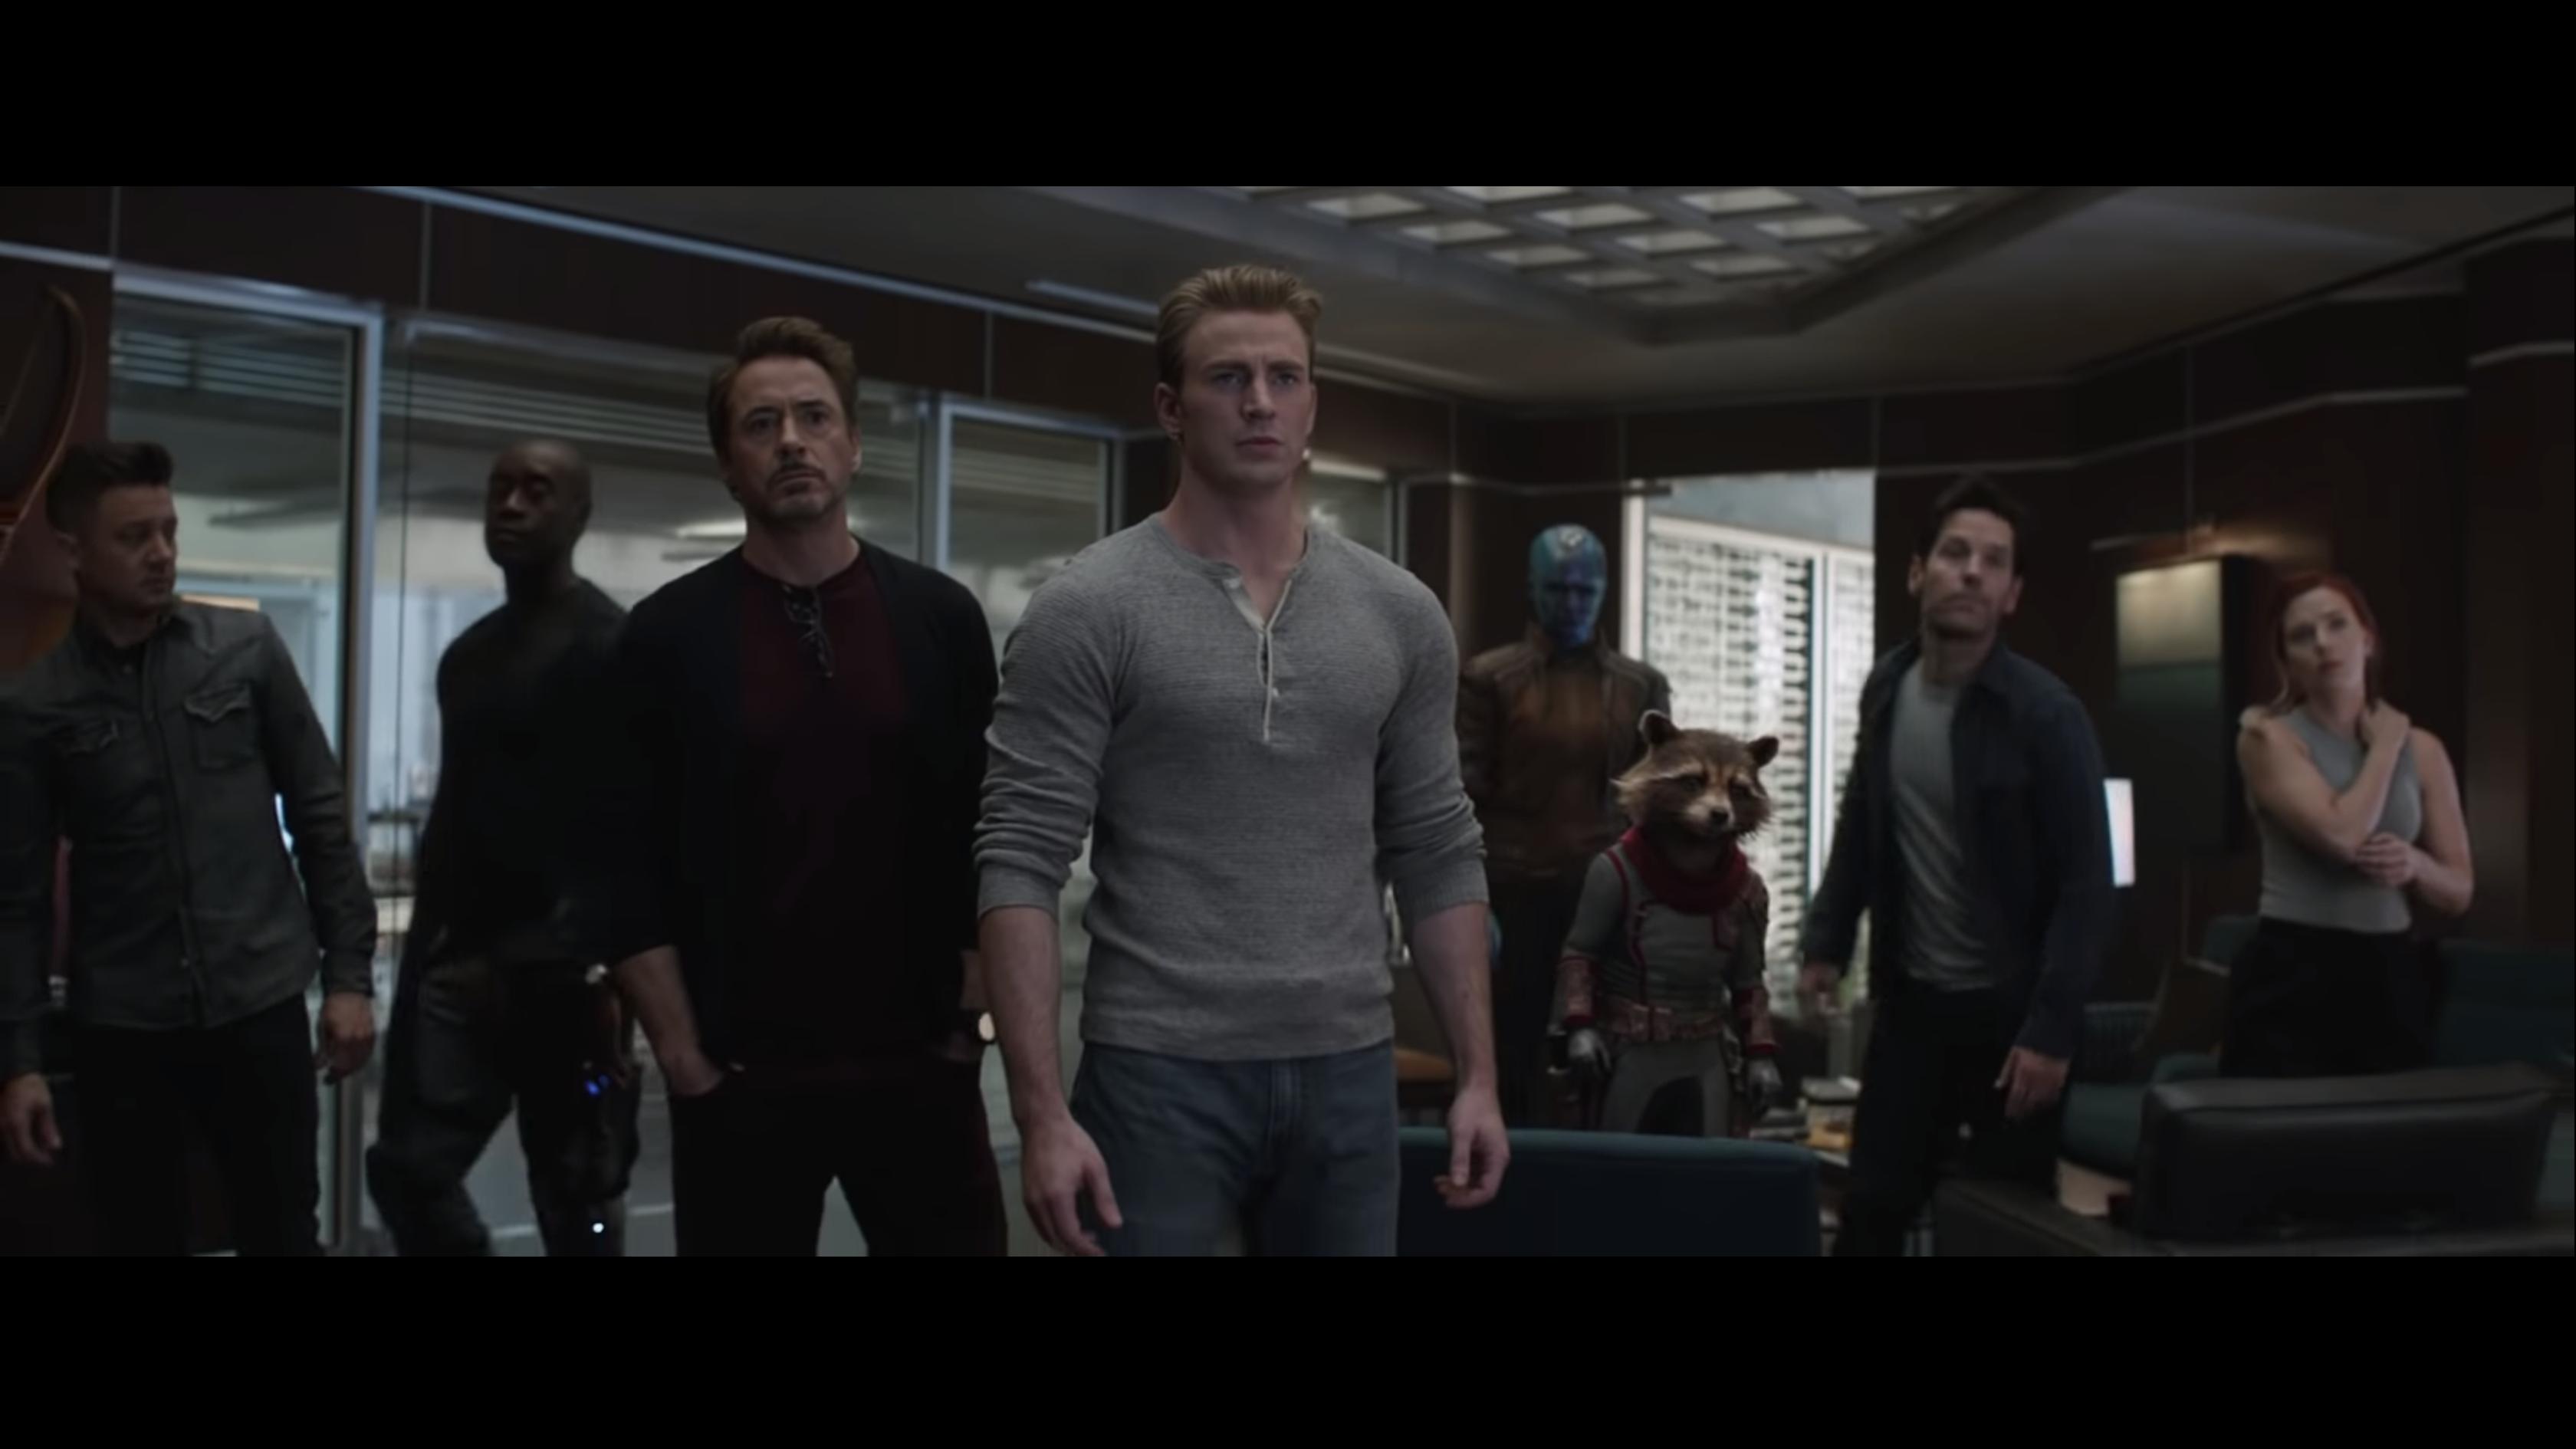 Avengers Endgame Is Breaking Websites As Tickets Go On Sale Quartz